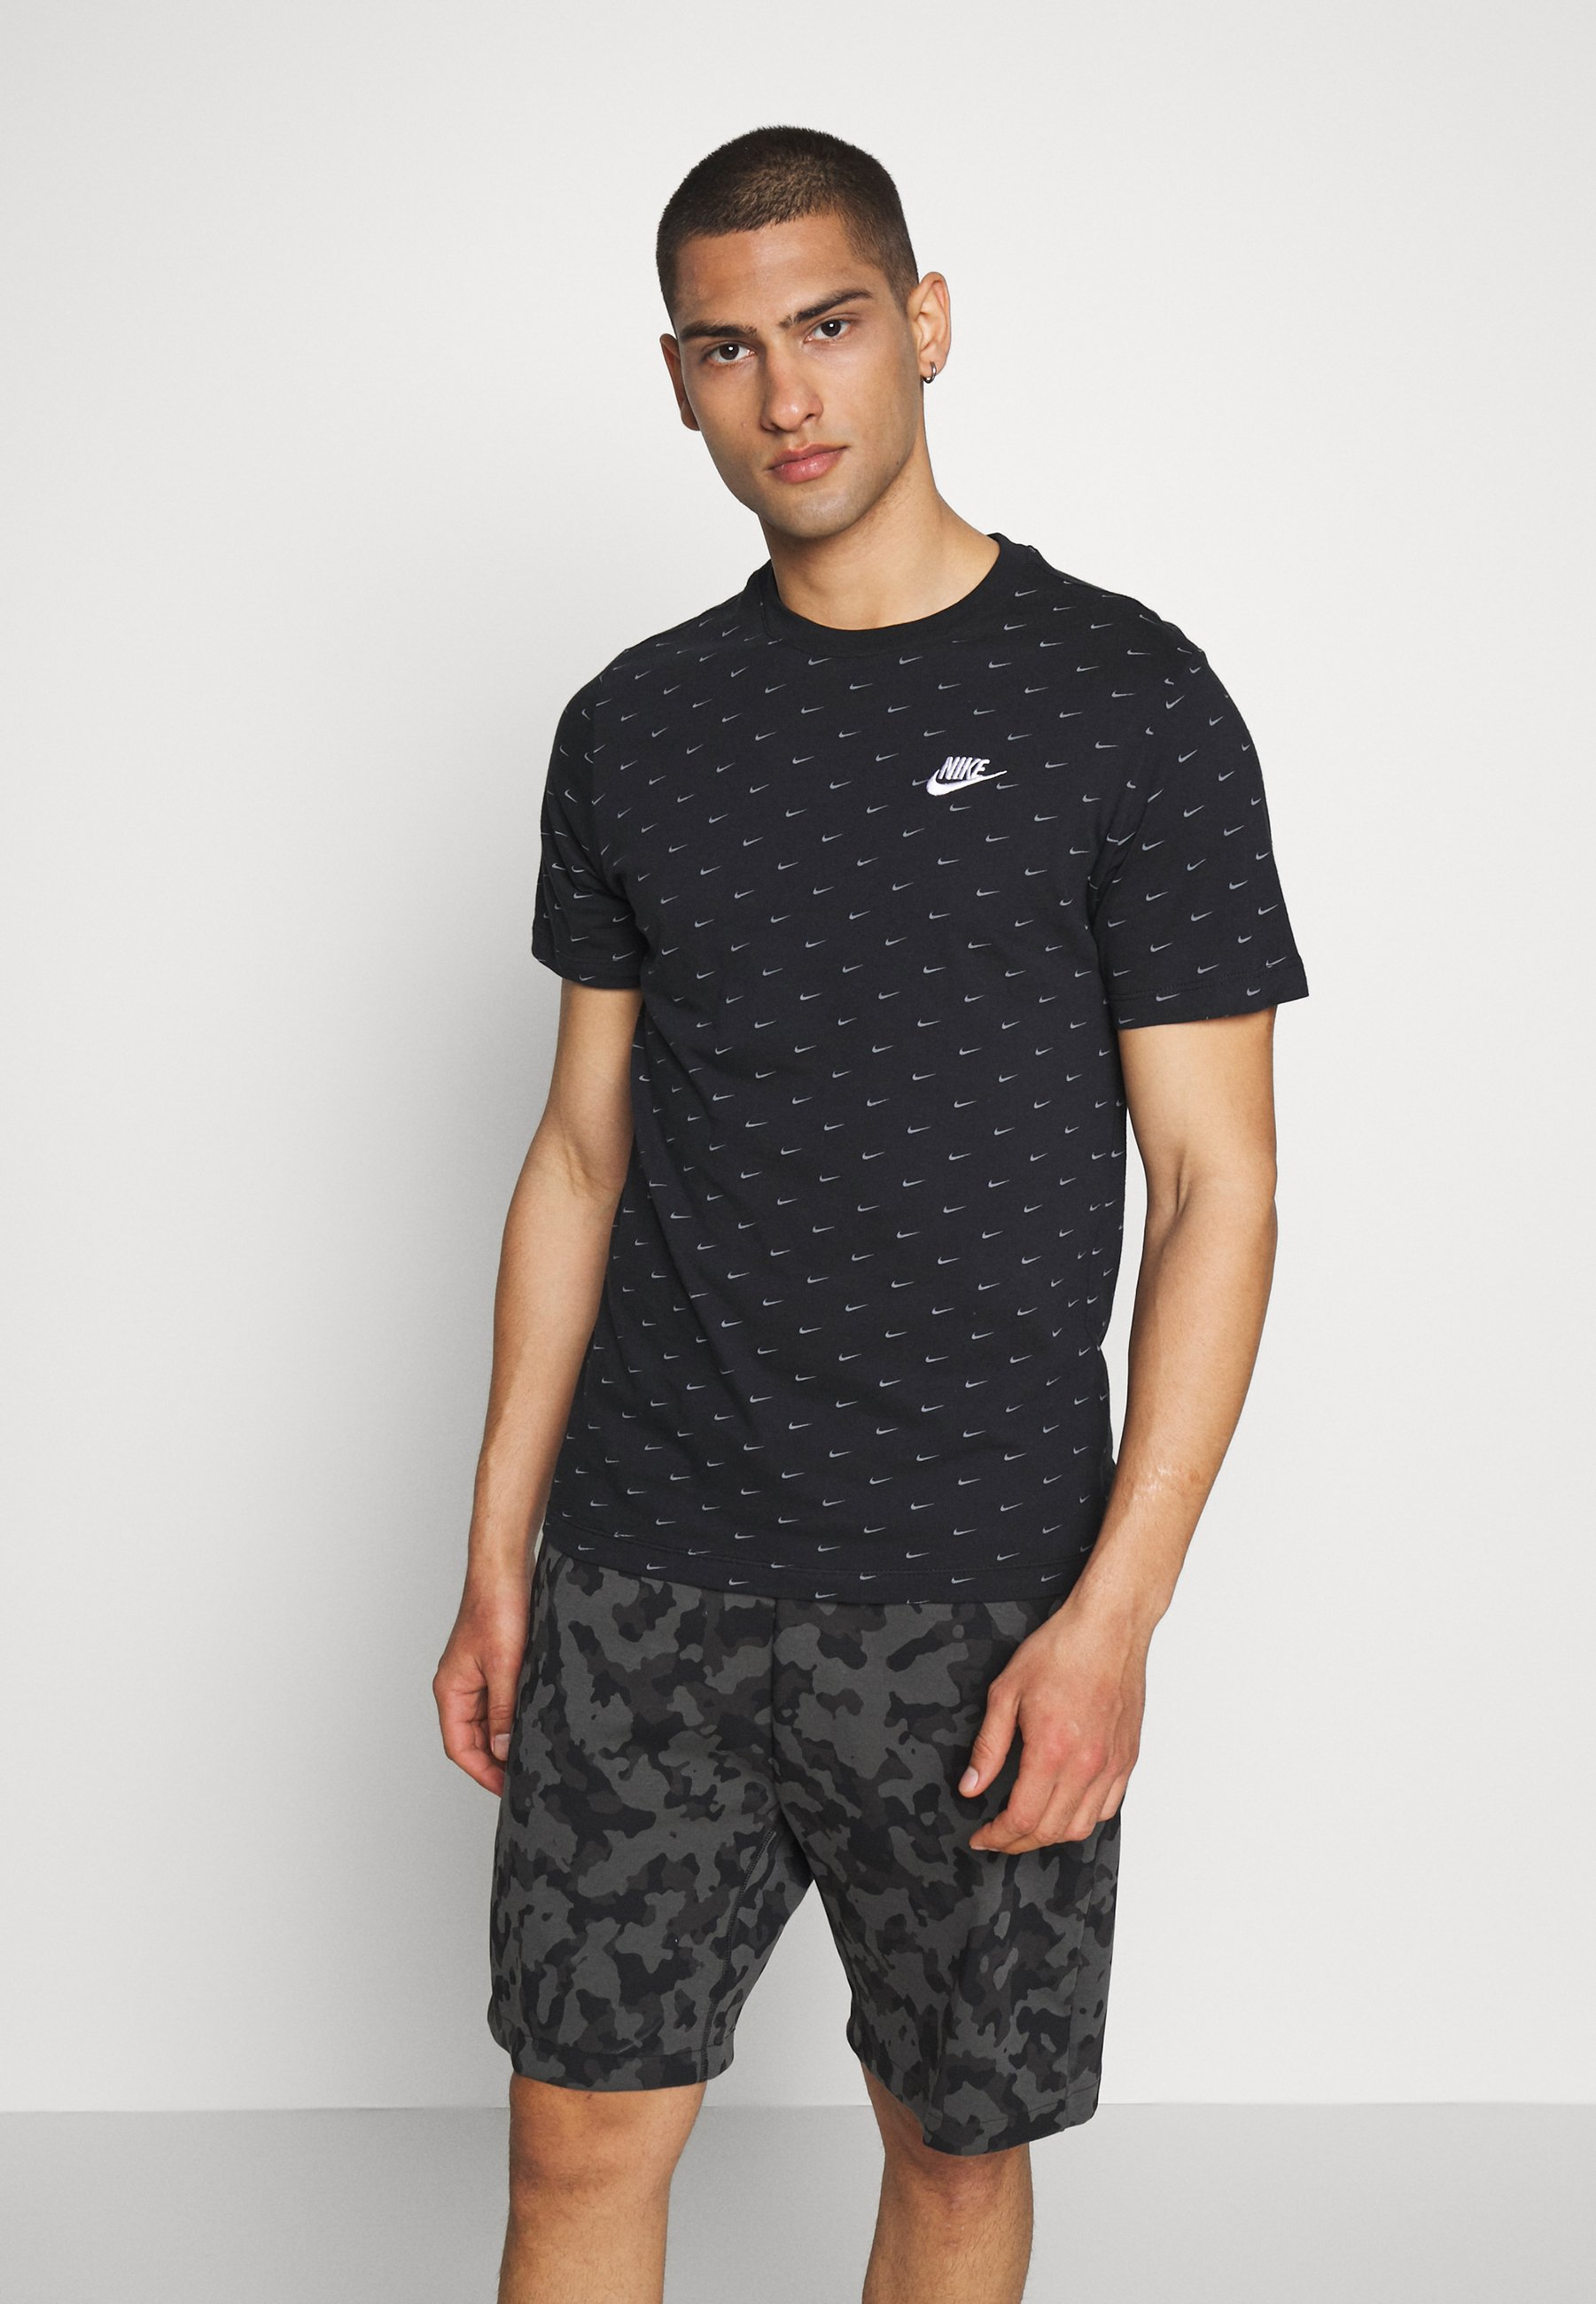 Nike Sportswear TEE MINI - T-shirt z nadrukiem - black/grey - Odzież męska Tani